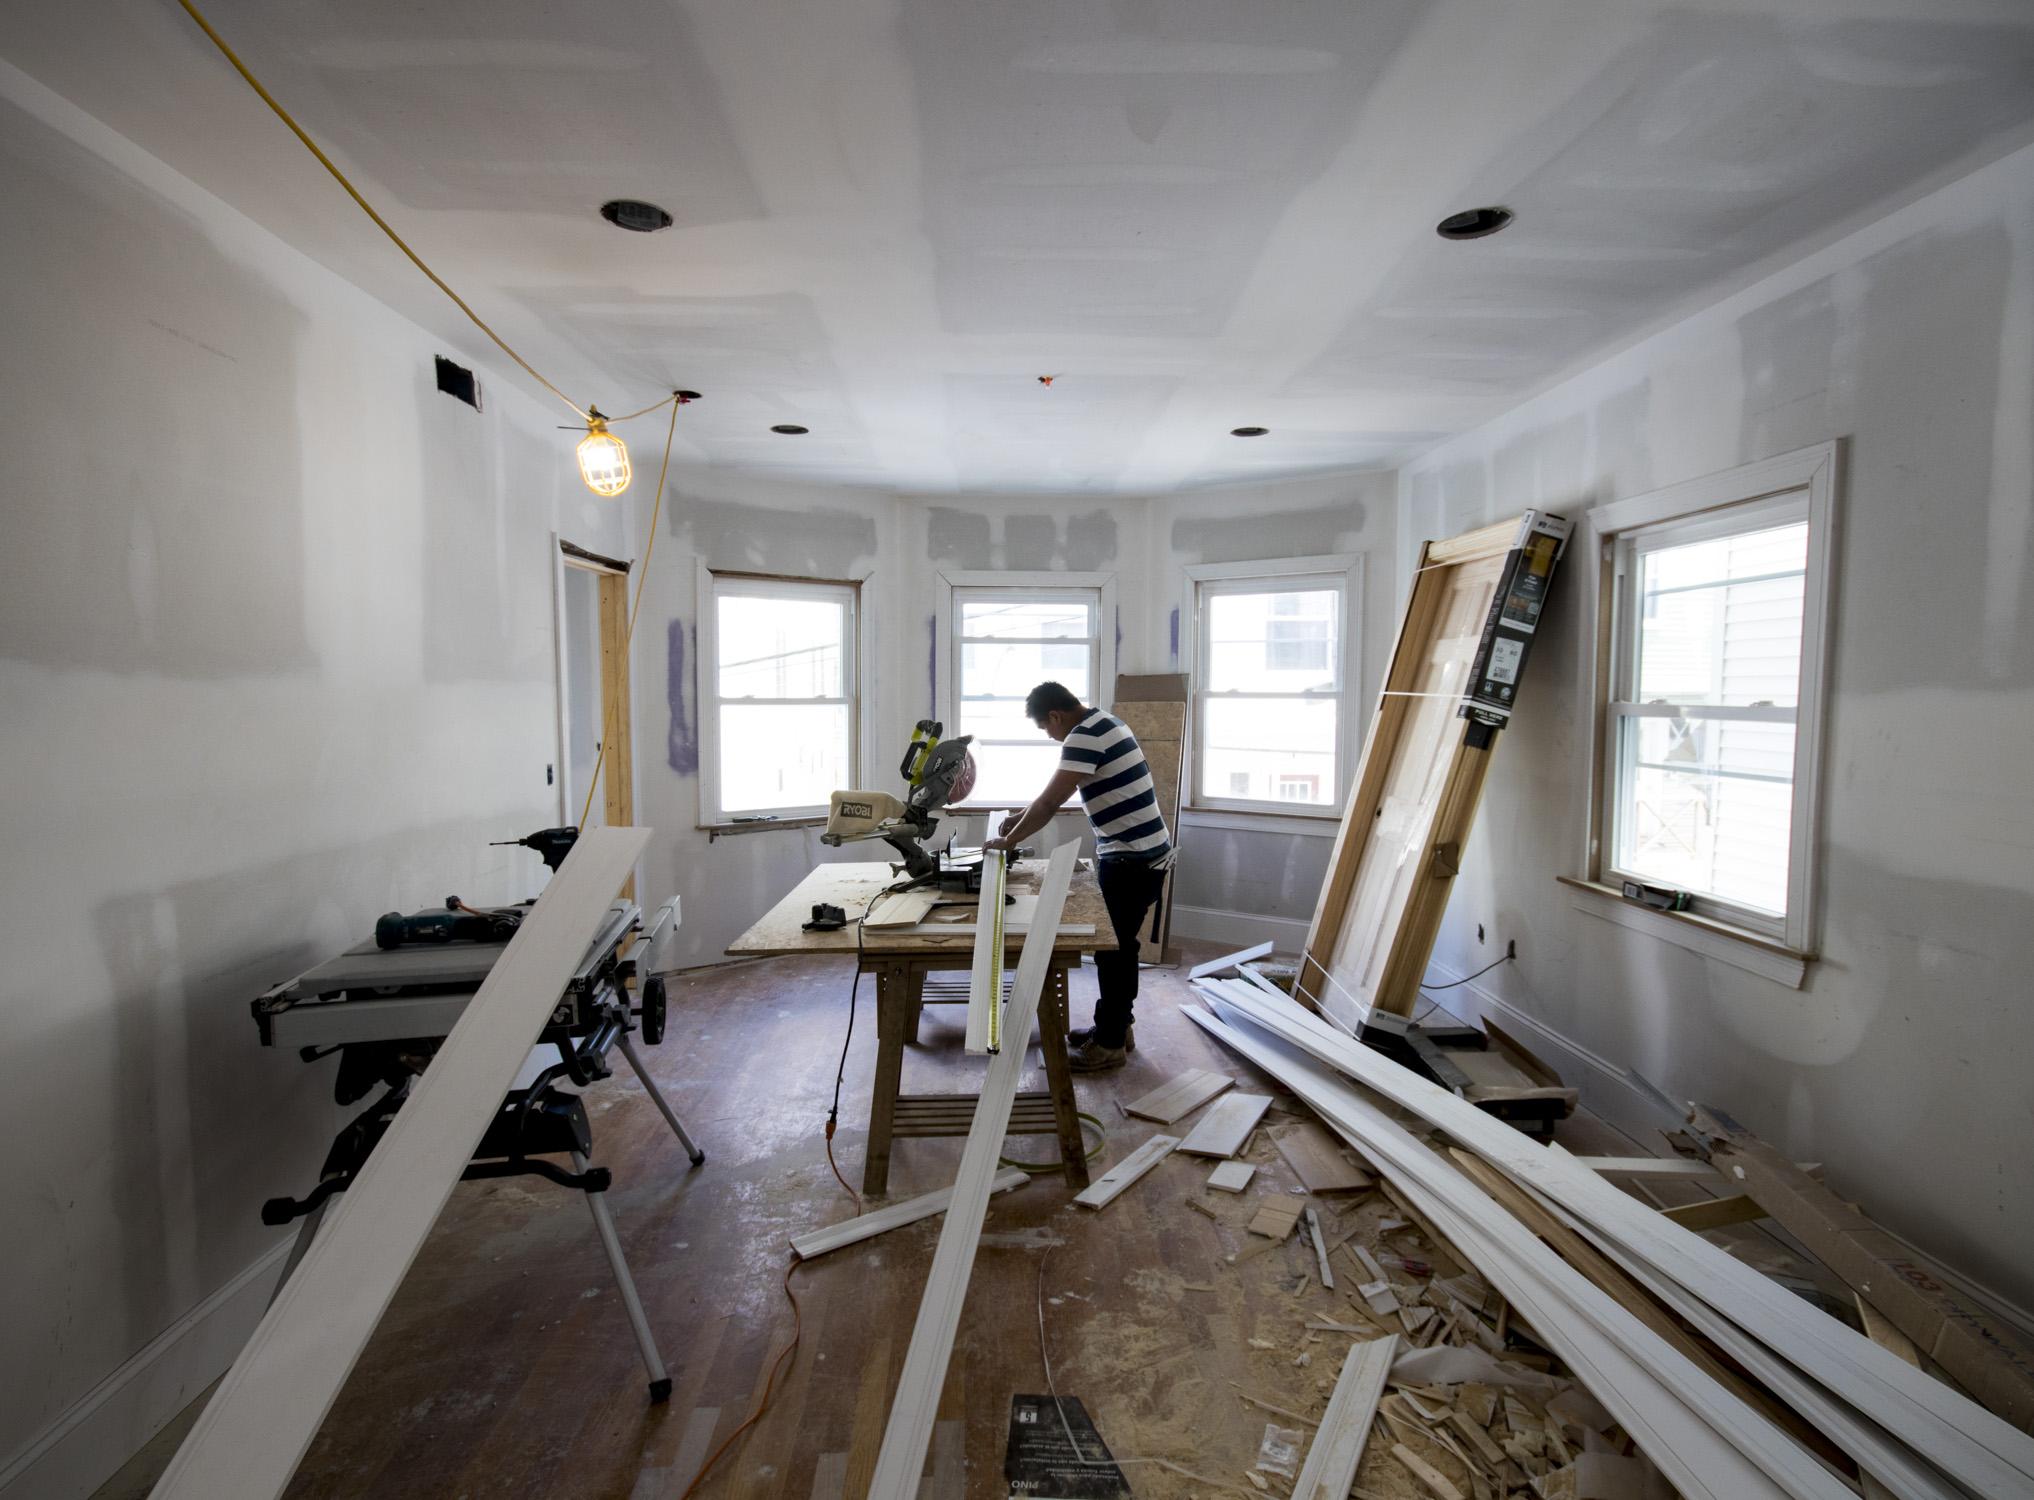 P. Northeast Contractors 27 Darling Street Boston Condo Renovation_110